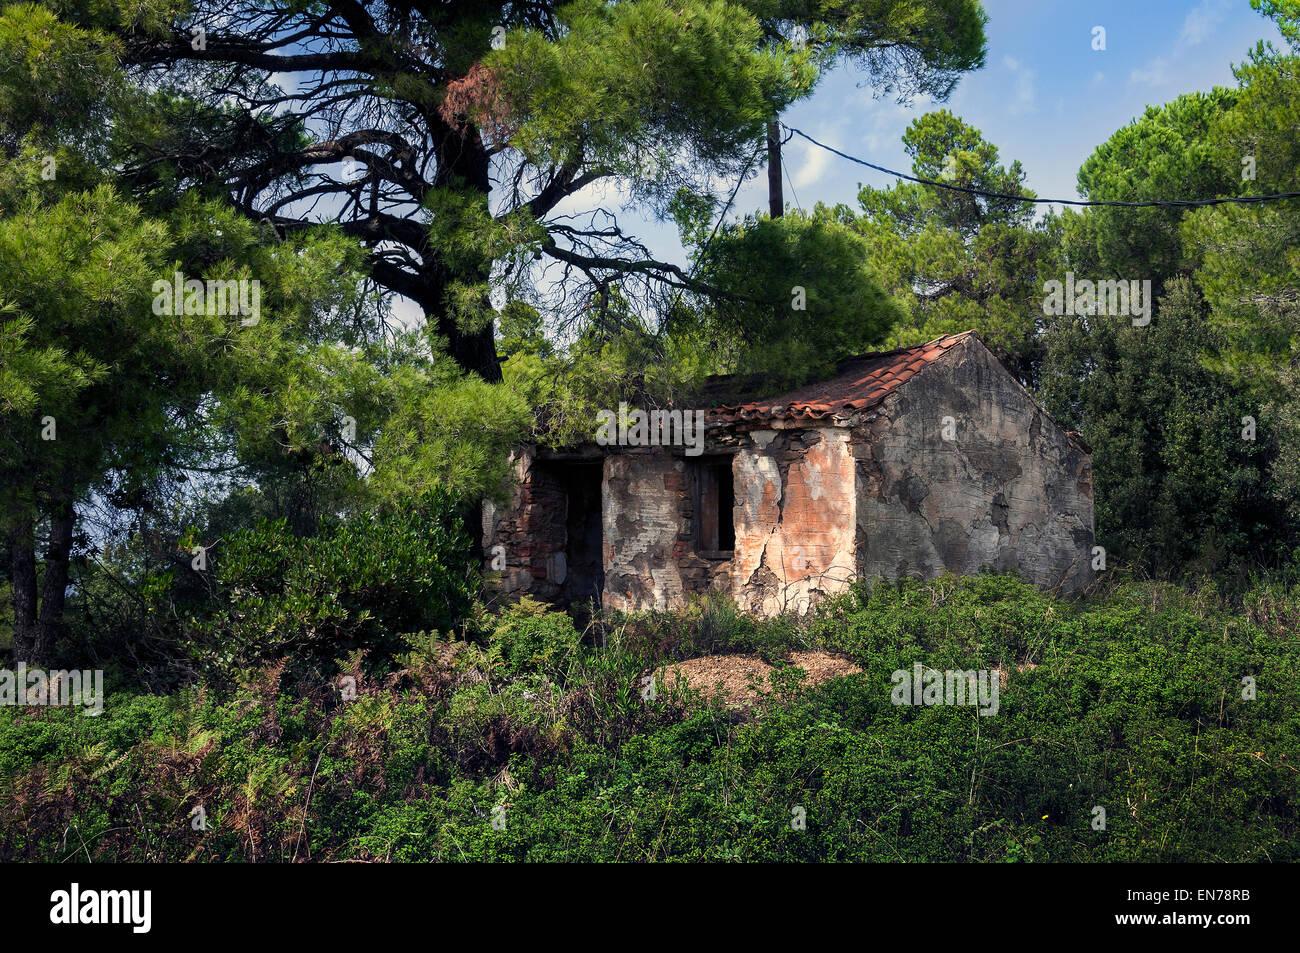 Old Building in Skiathos. - Stock Image